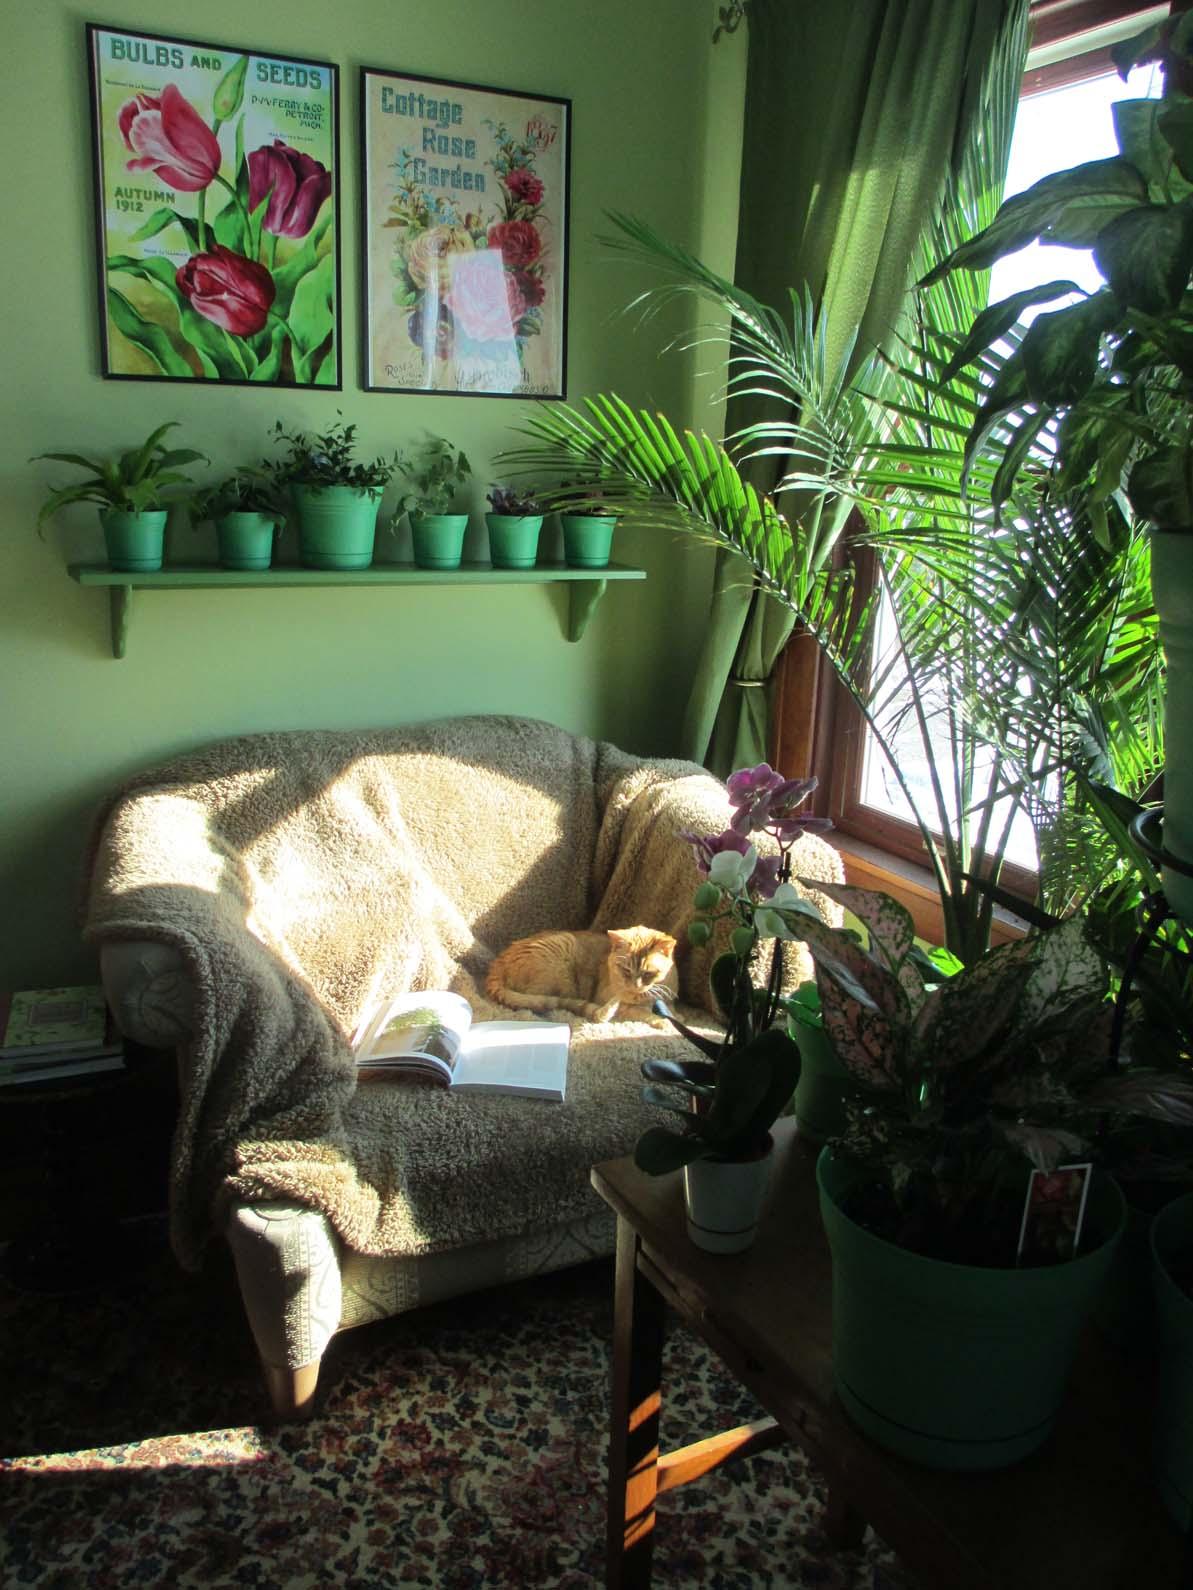 Garden Fancy: Winter Sunroom Dreams